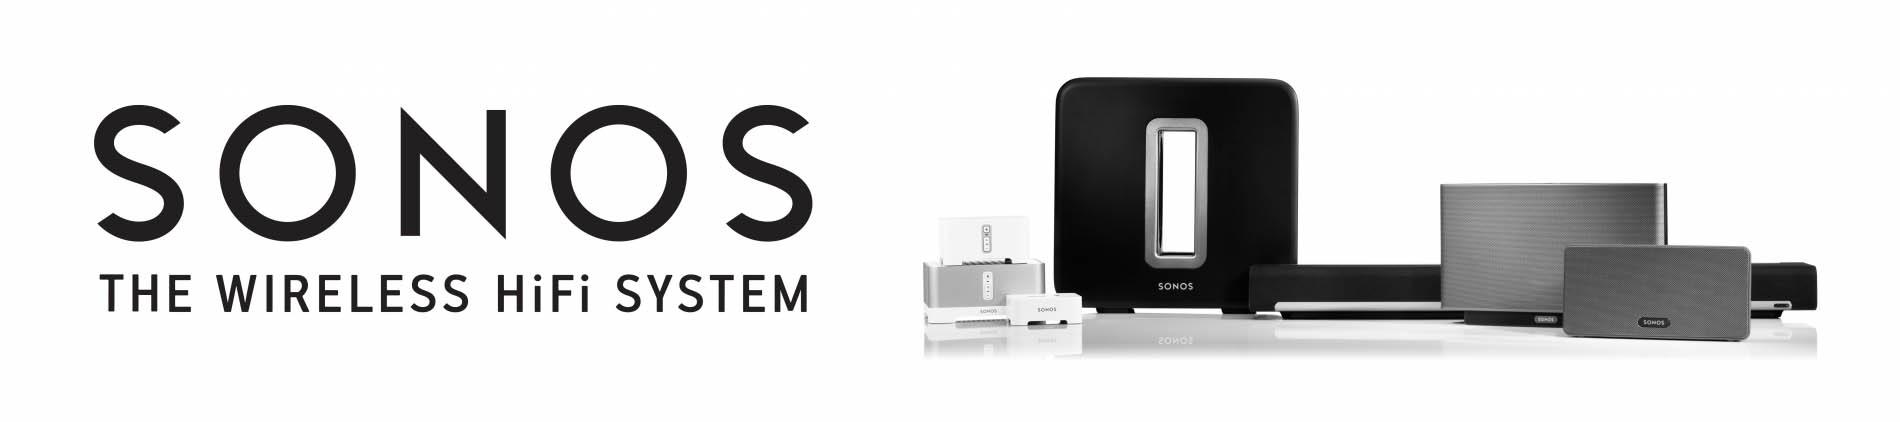 Sonos,wireless,music,streaming